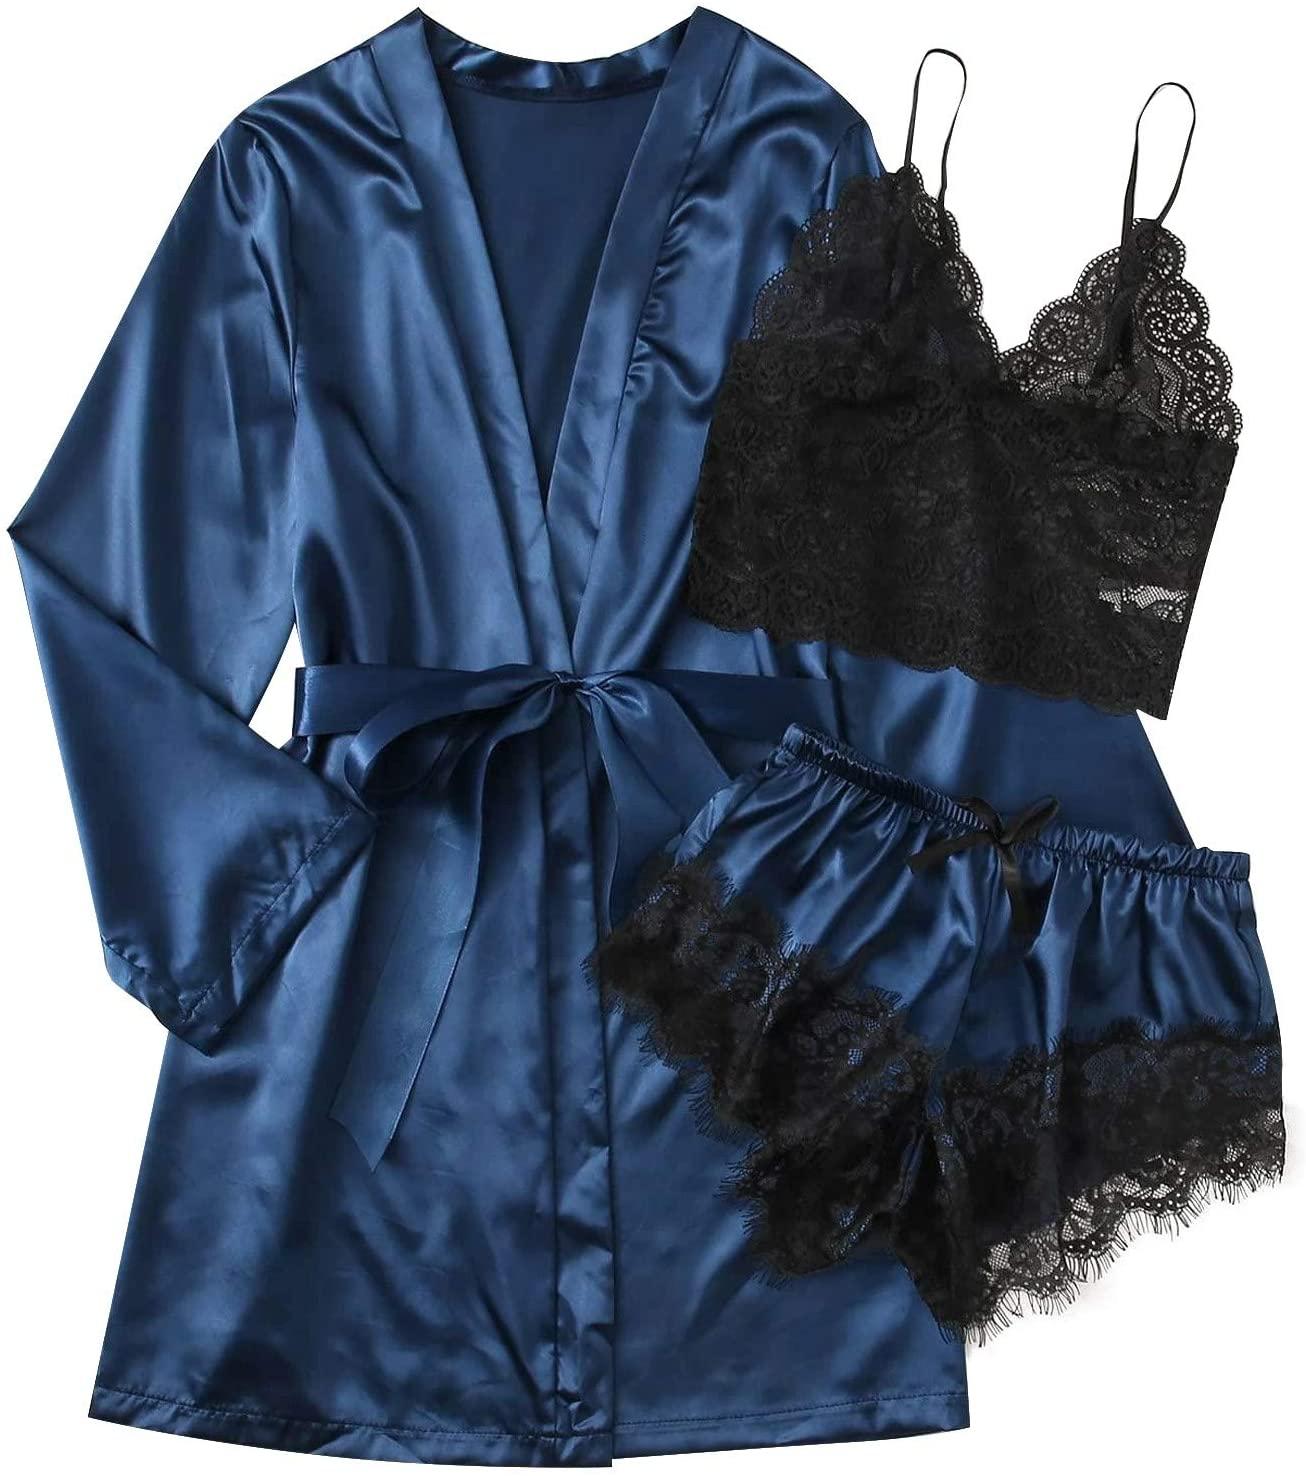 Nywaba Women's Sexy Pajamas Lingerie Lace Sleepwear Chemise Satin Slip Silk Nightie, Women Nightdress Lingerie Robes Underwear Sleepwear Sexy